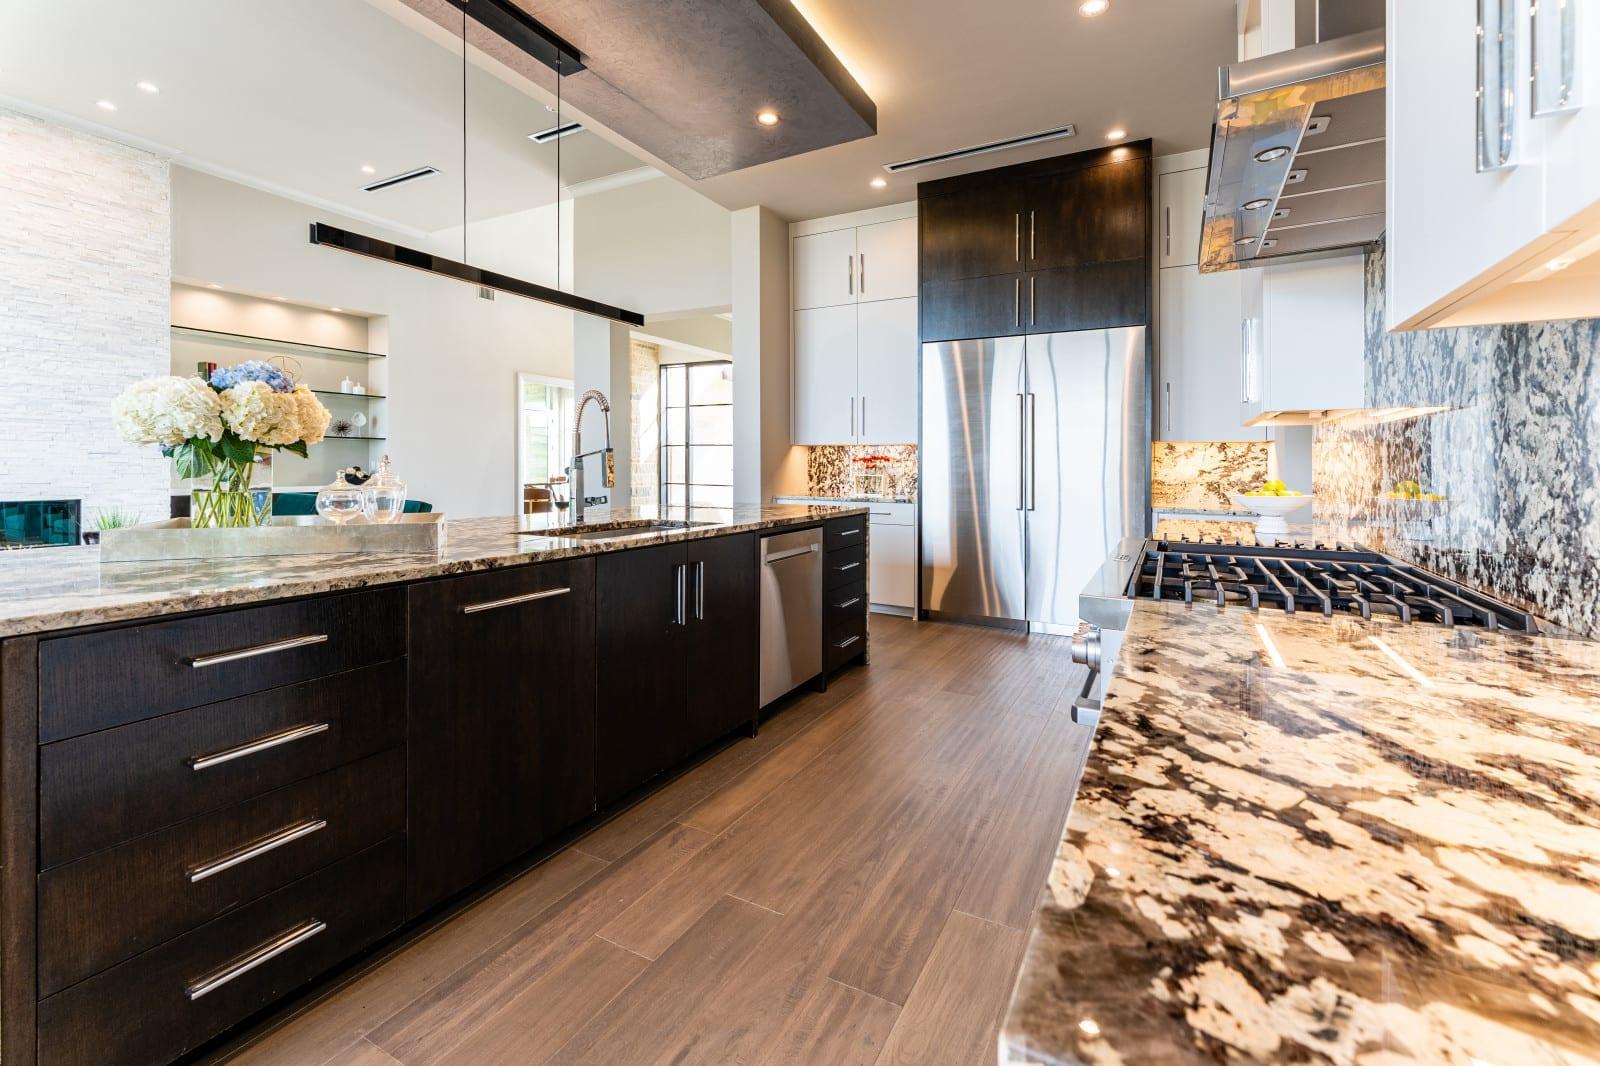 Modern Style Homes design # 14 - Millennial Design + Build